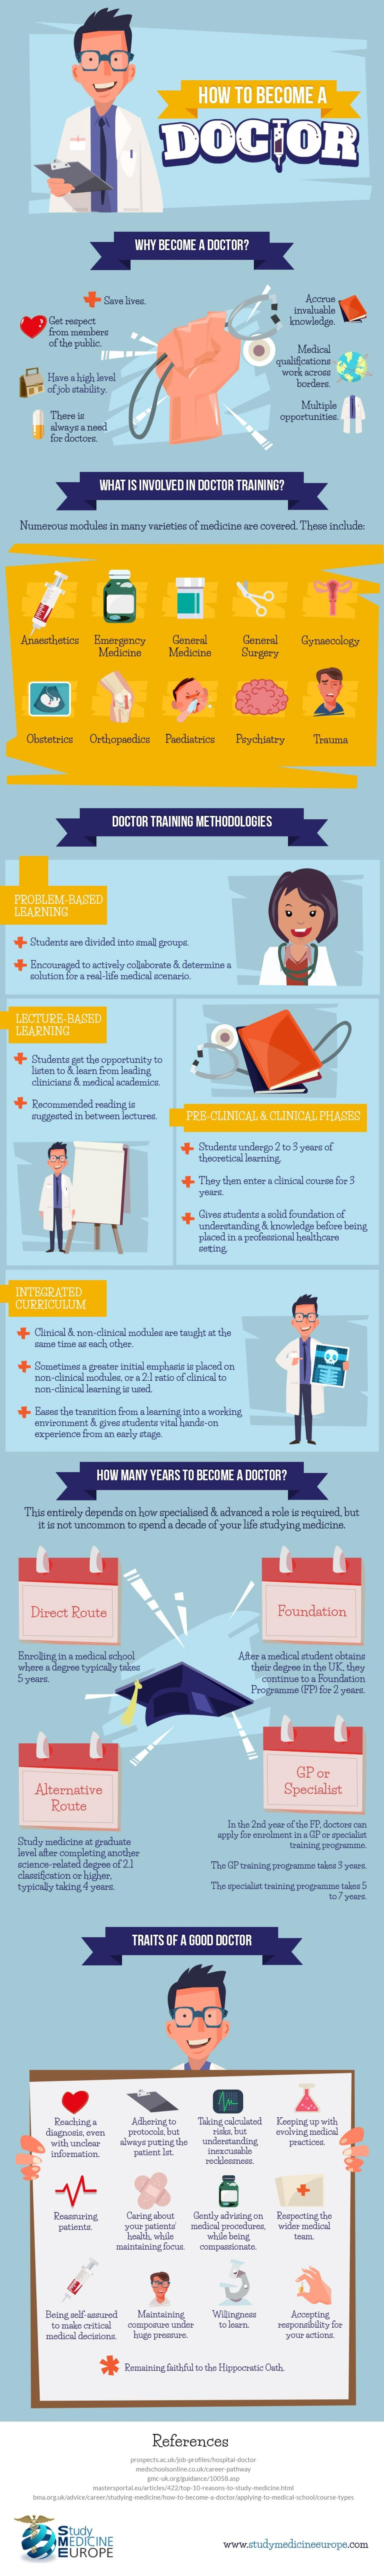 Source:  Study Medicine Europe